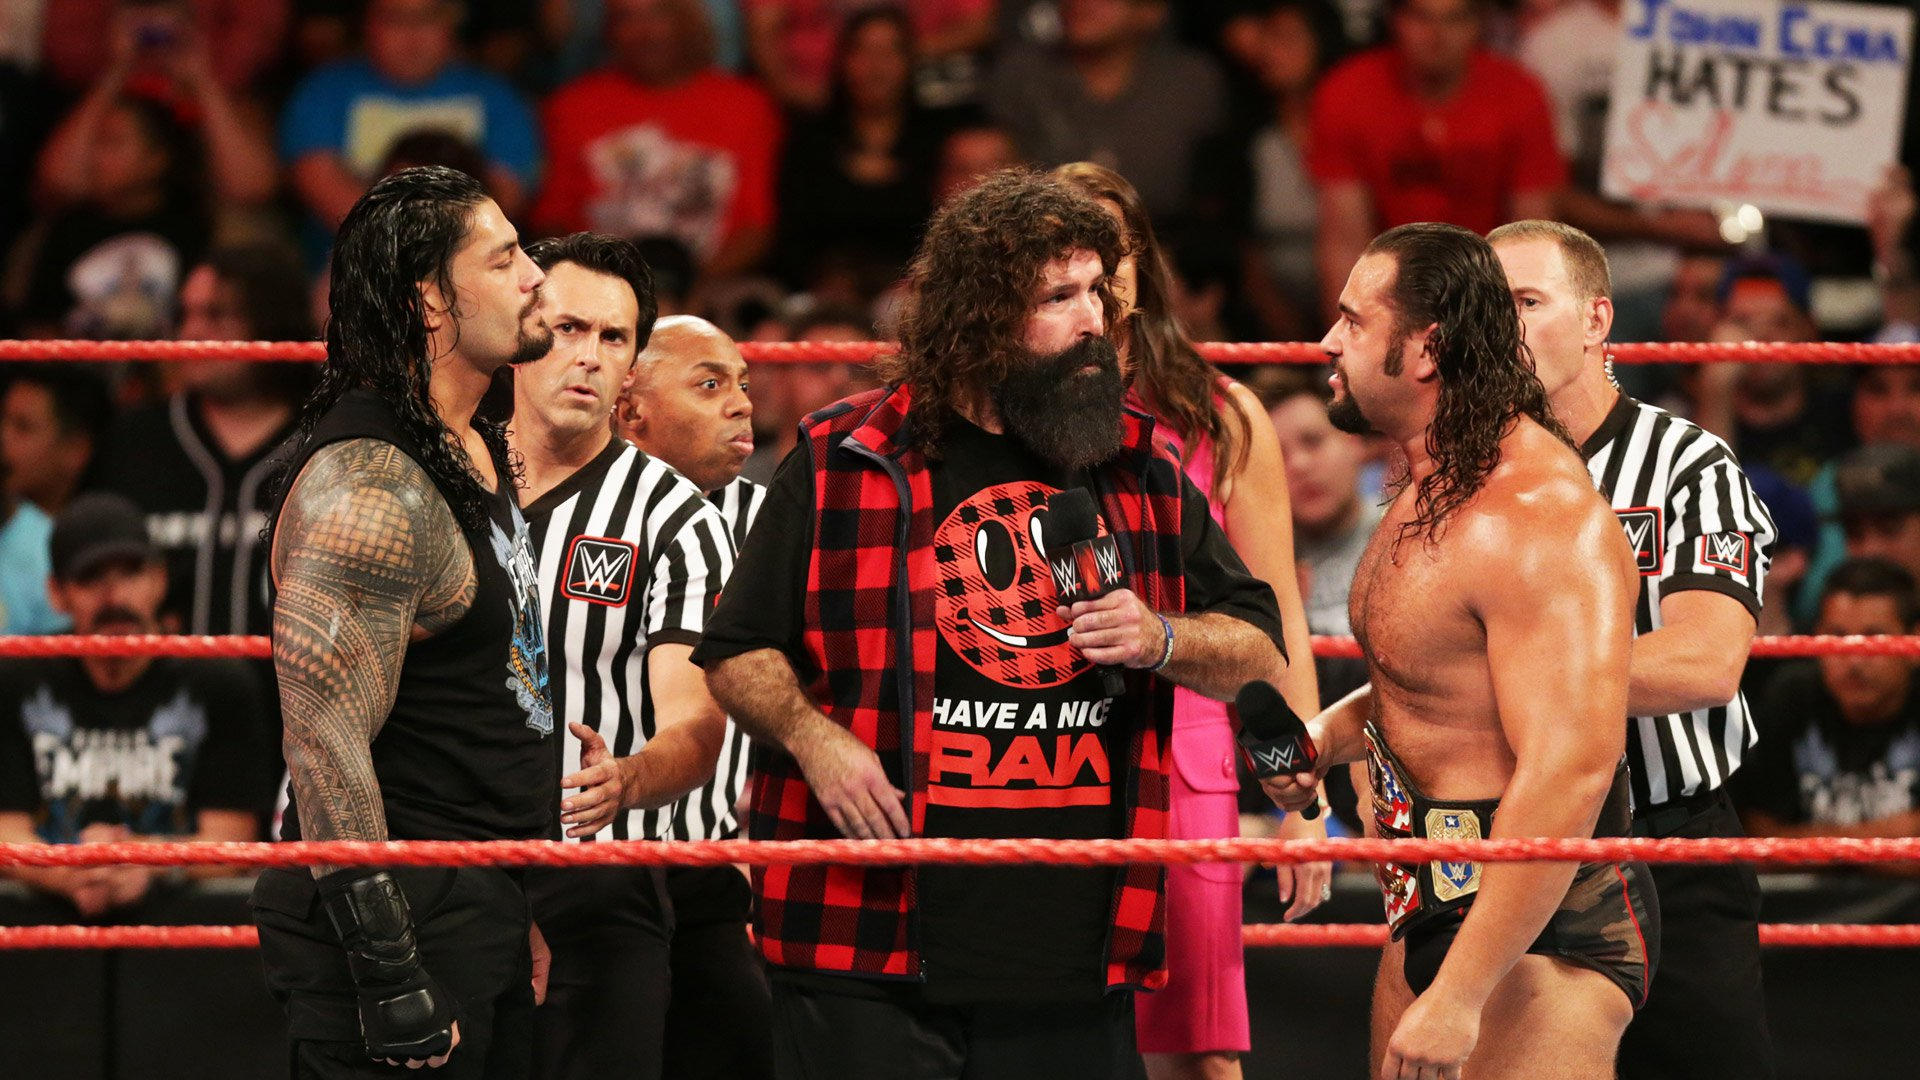 Resultats WWE RAW 15 aout